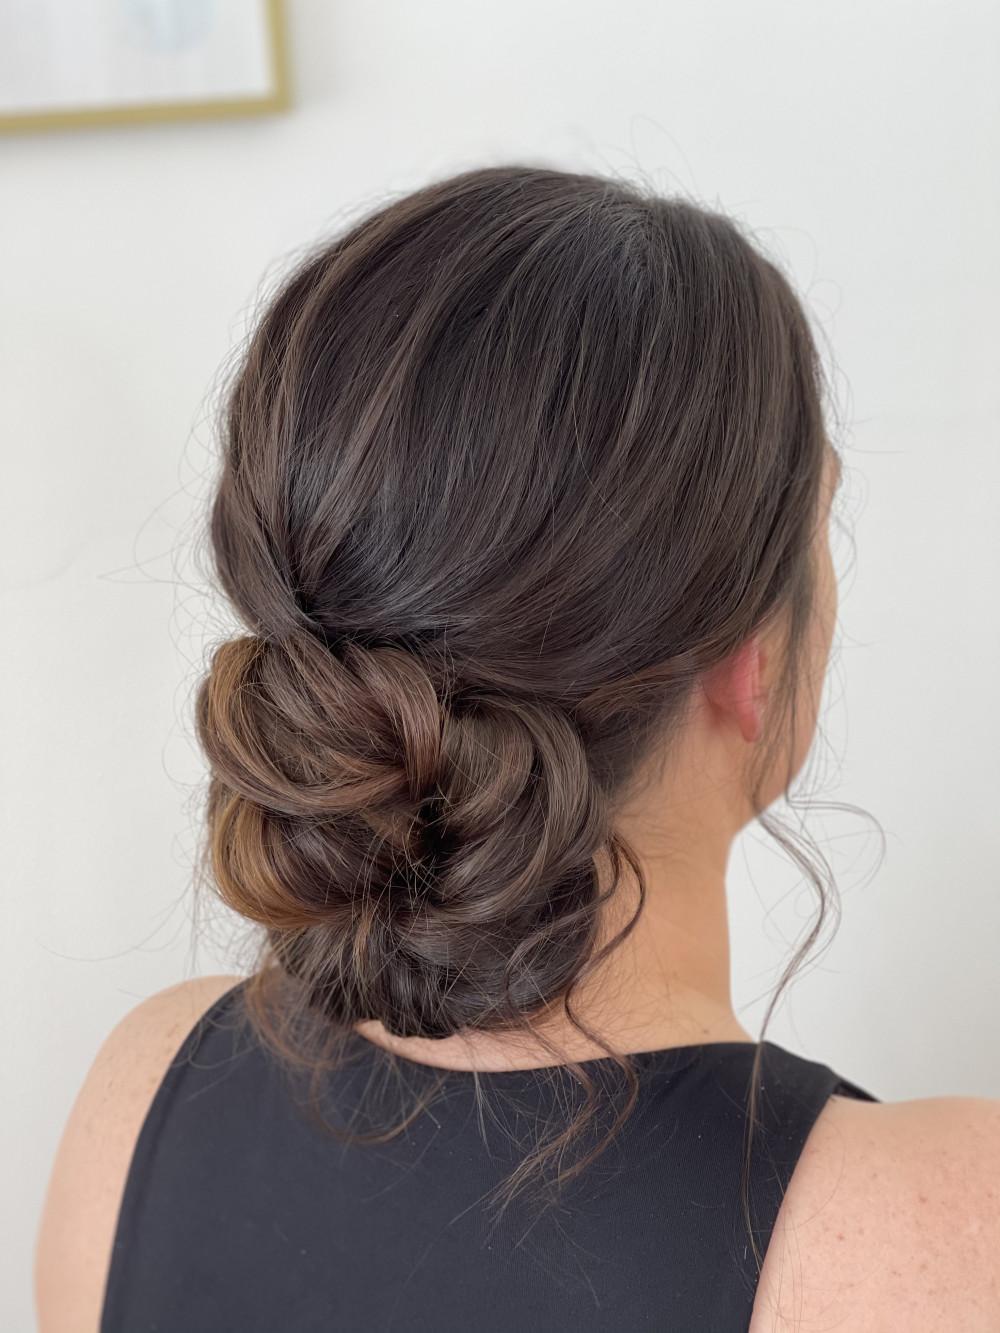 - Make Me Bridal Artist: Holly Louise London. #boho #updo #brunette #texturedupdo